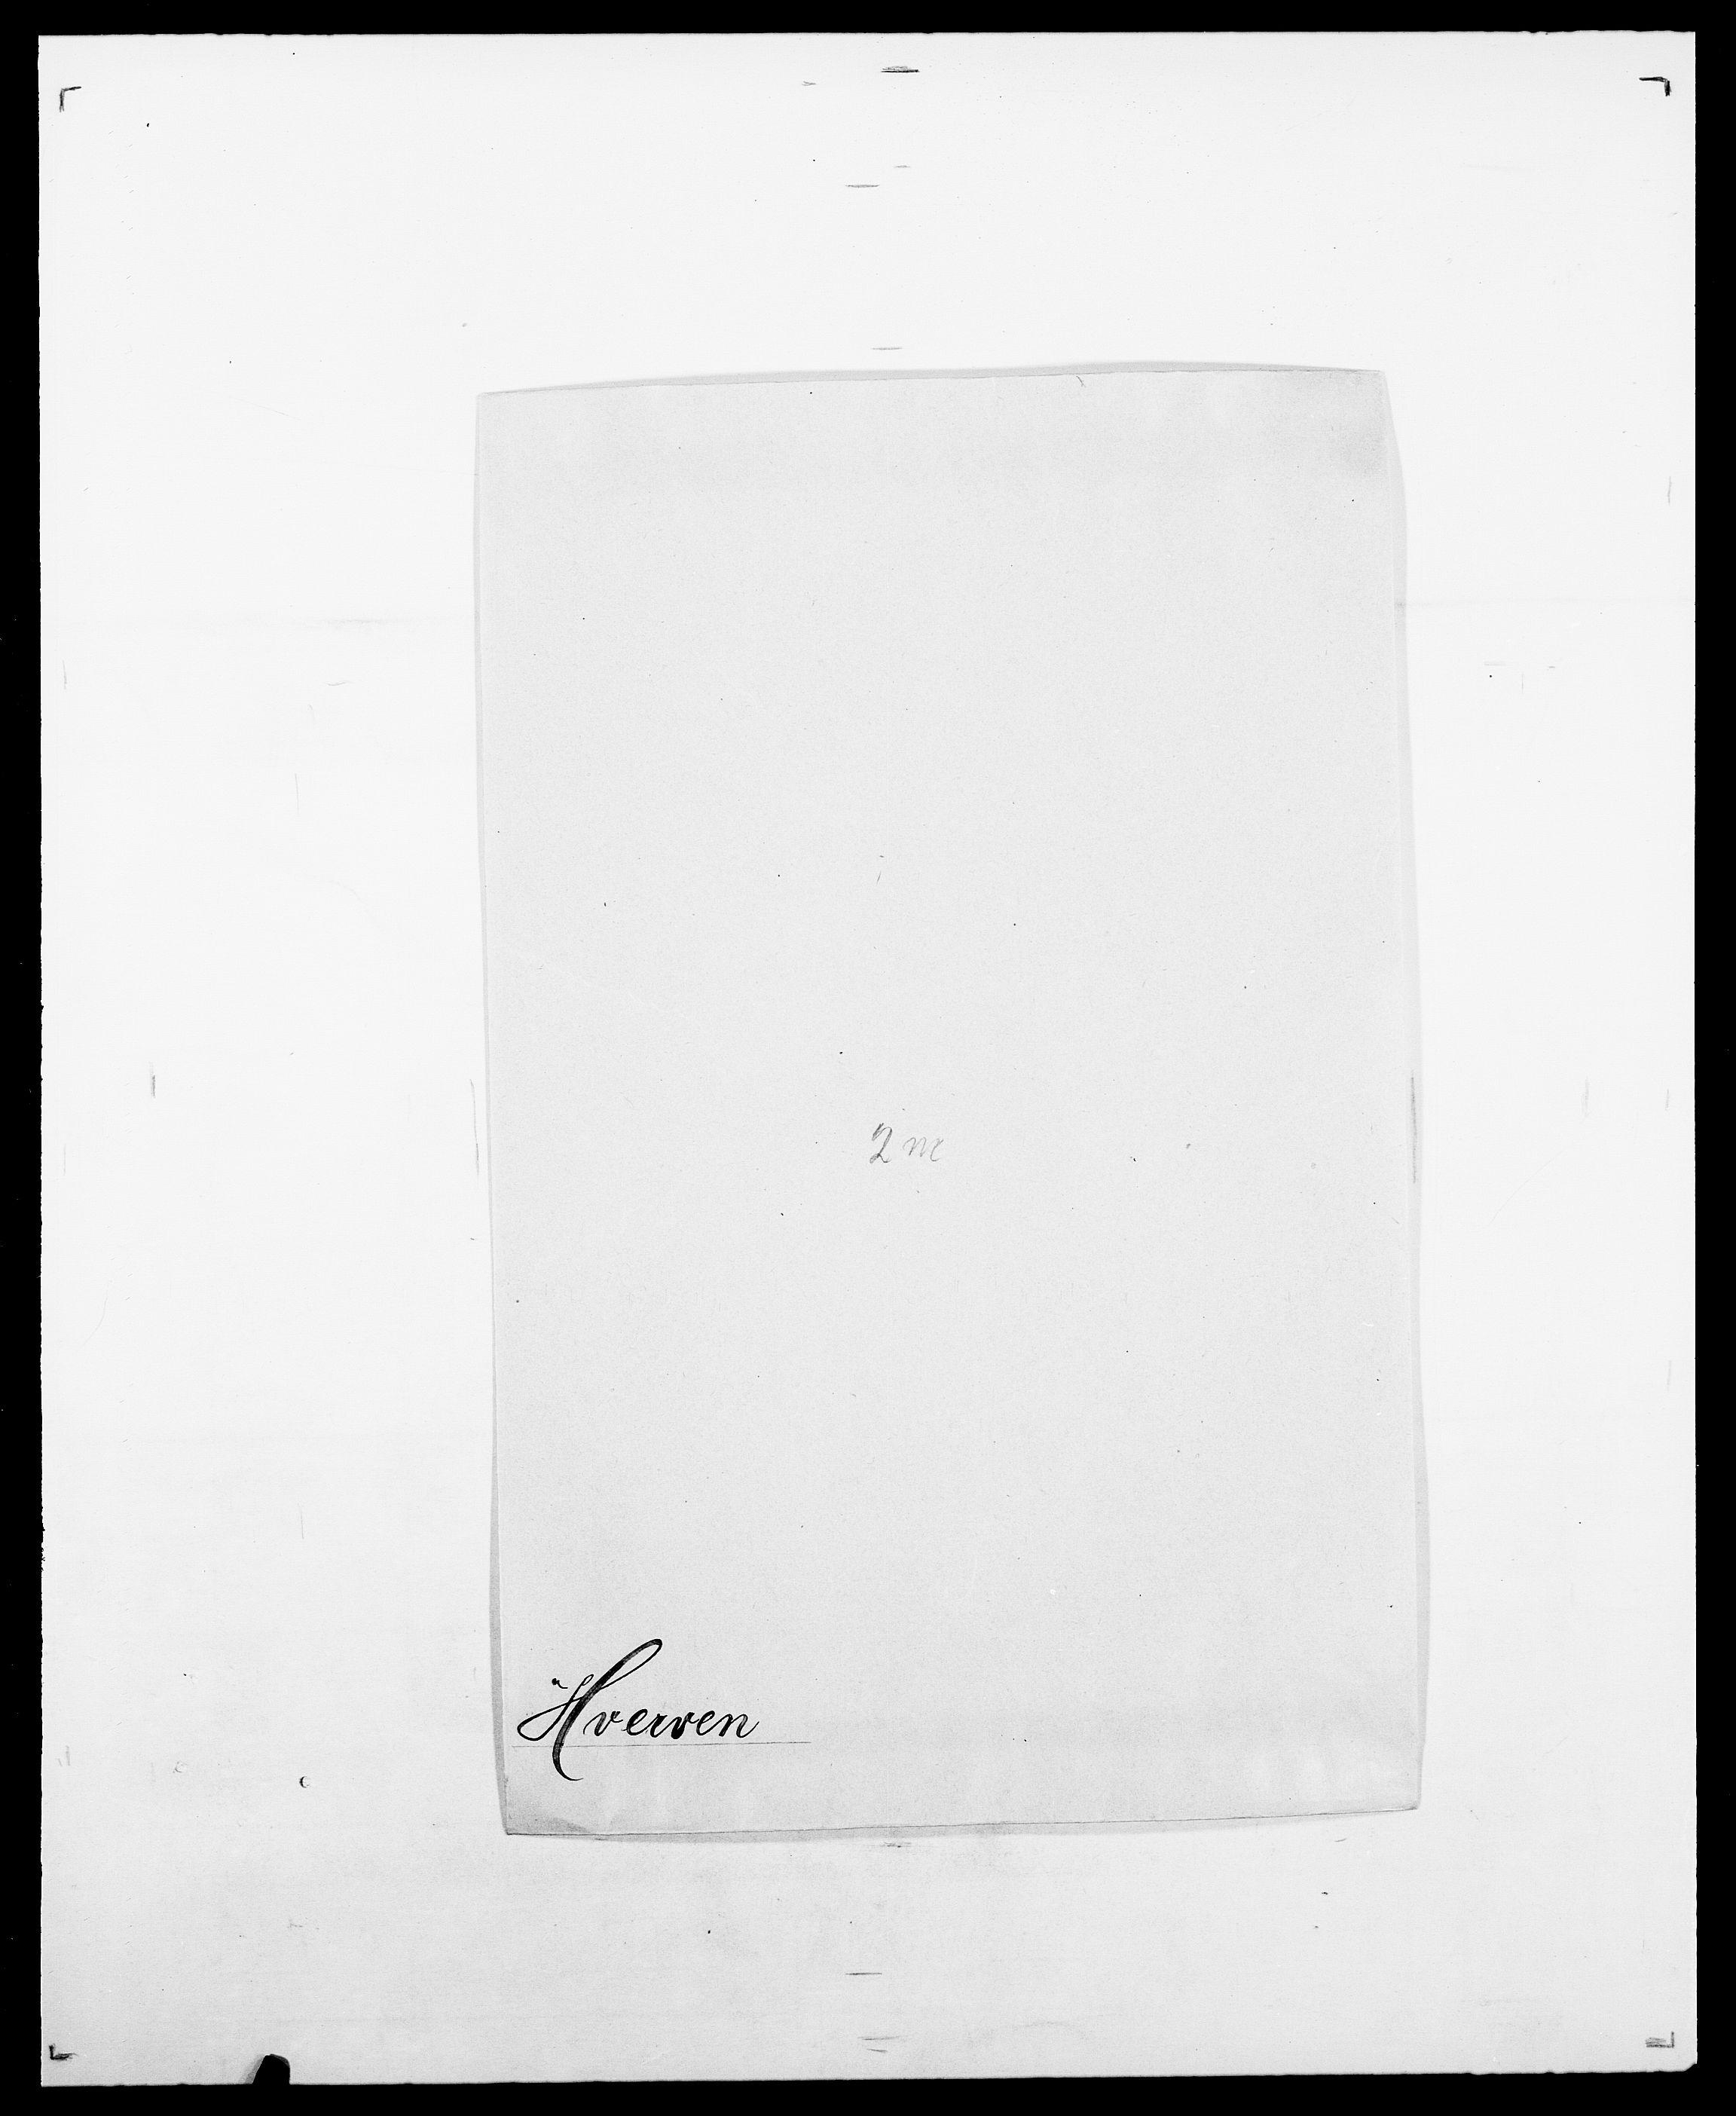 SAO, Delgobe, Charles Antoine - samling, D/Da/L0019: van der Hude - Joys, s. 146